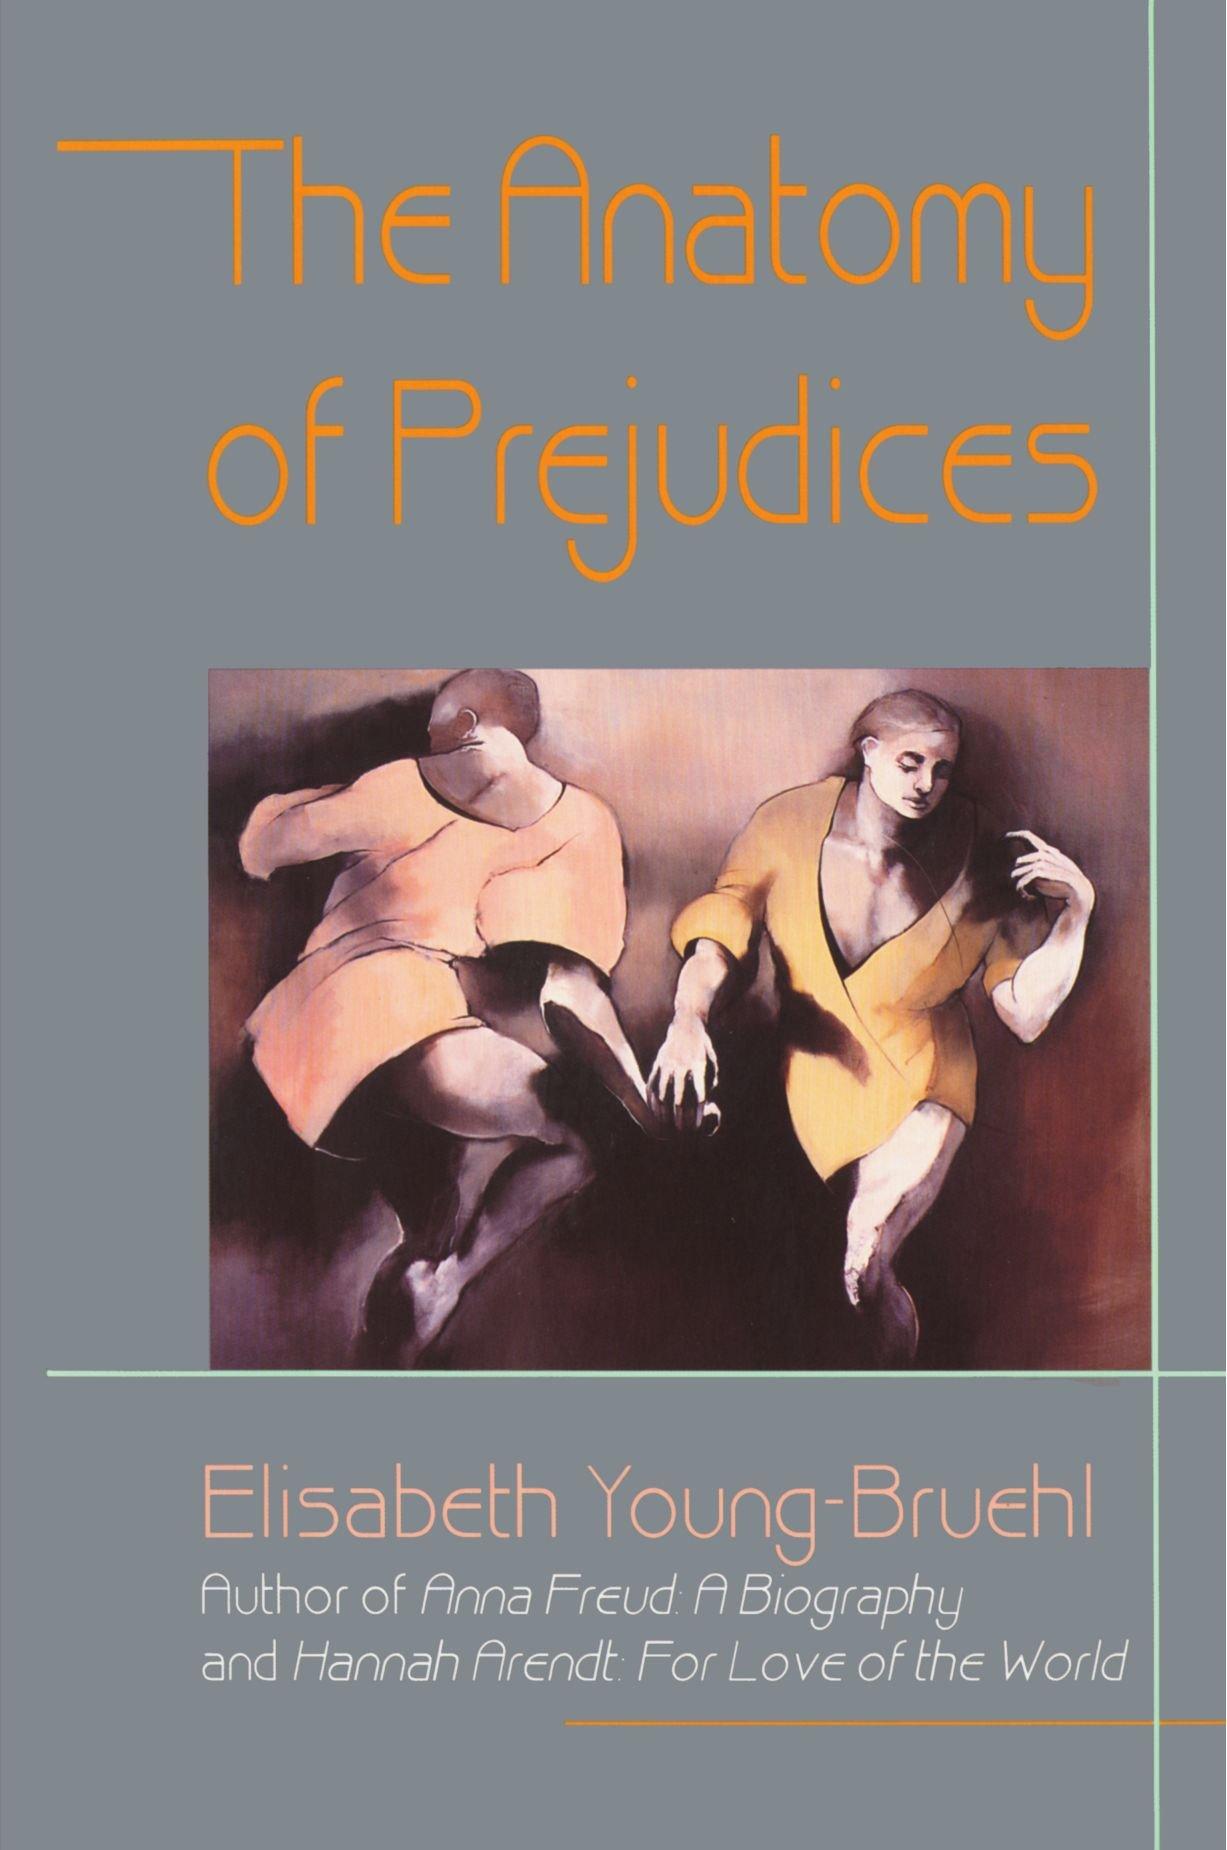 The Anatomy of Prejudices: Amazon.co.uk: Elisabeth Young-Bruehl ...